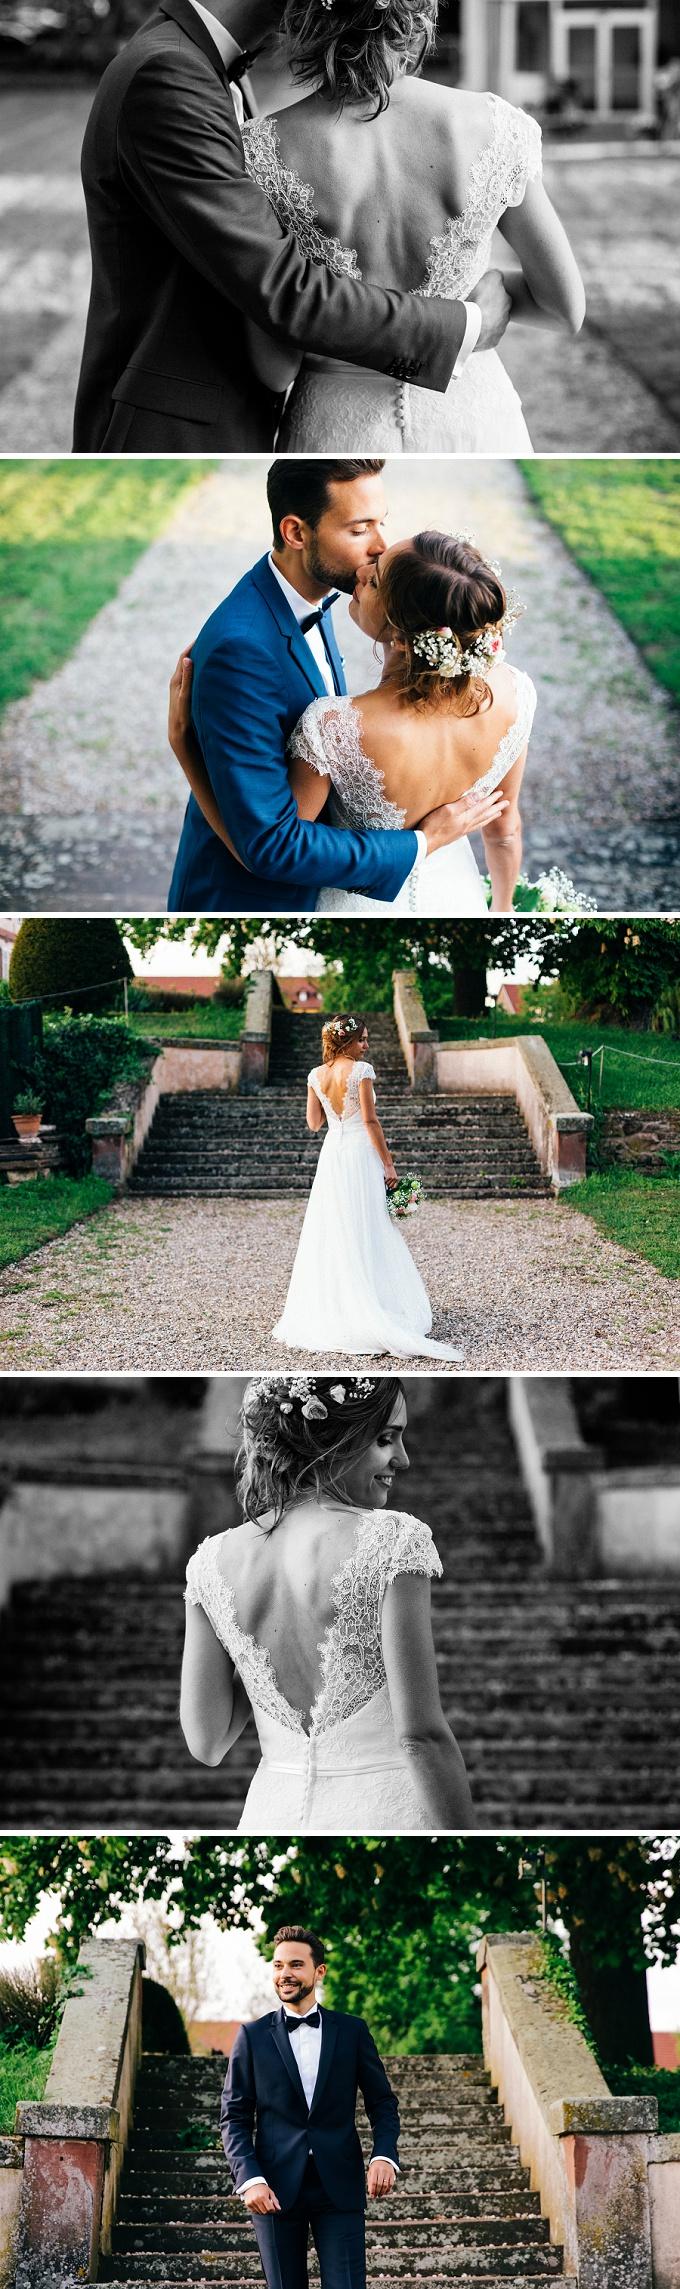 mariage-chateau-dosthoffen-029.jpg